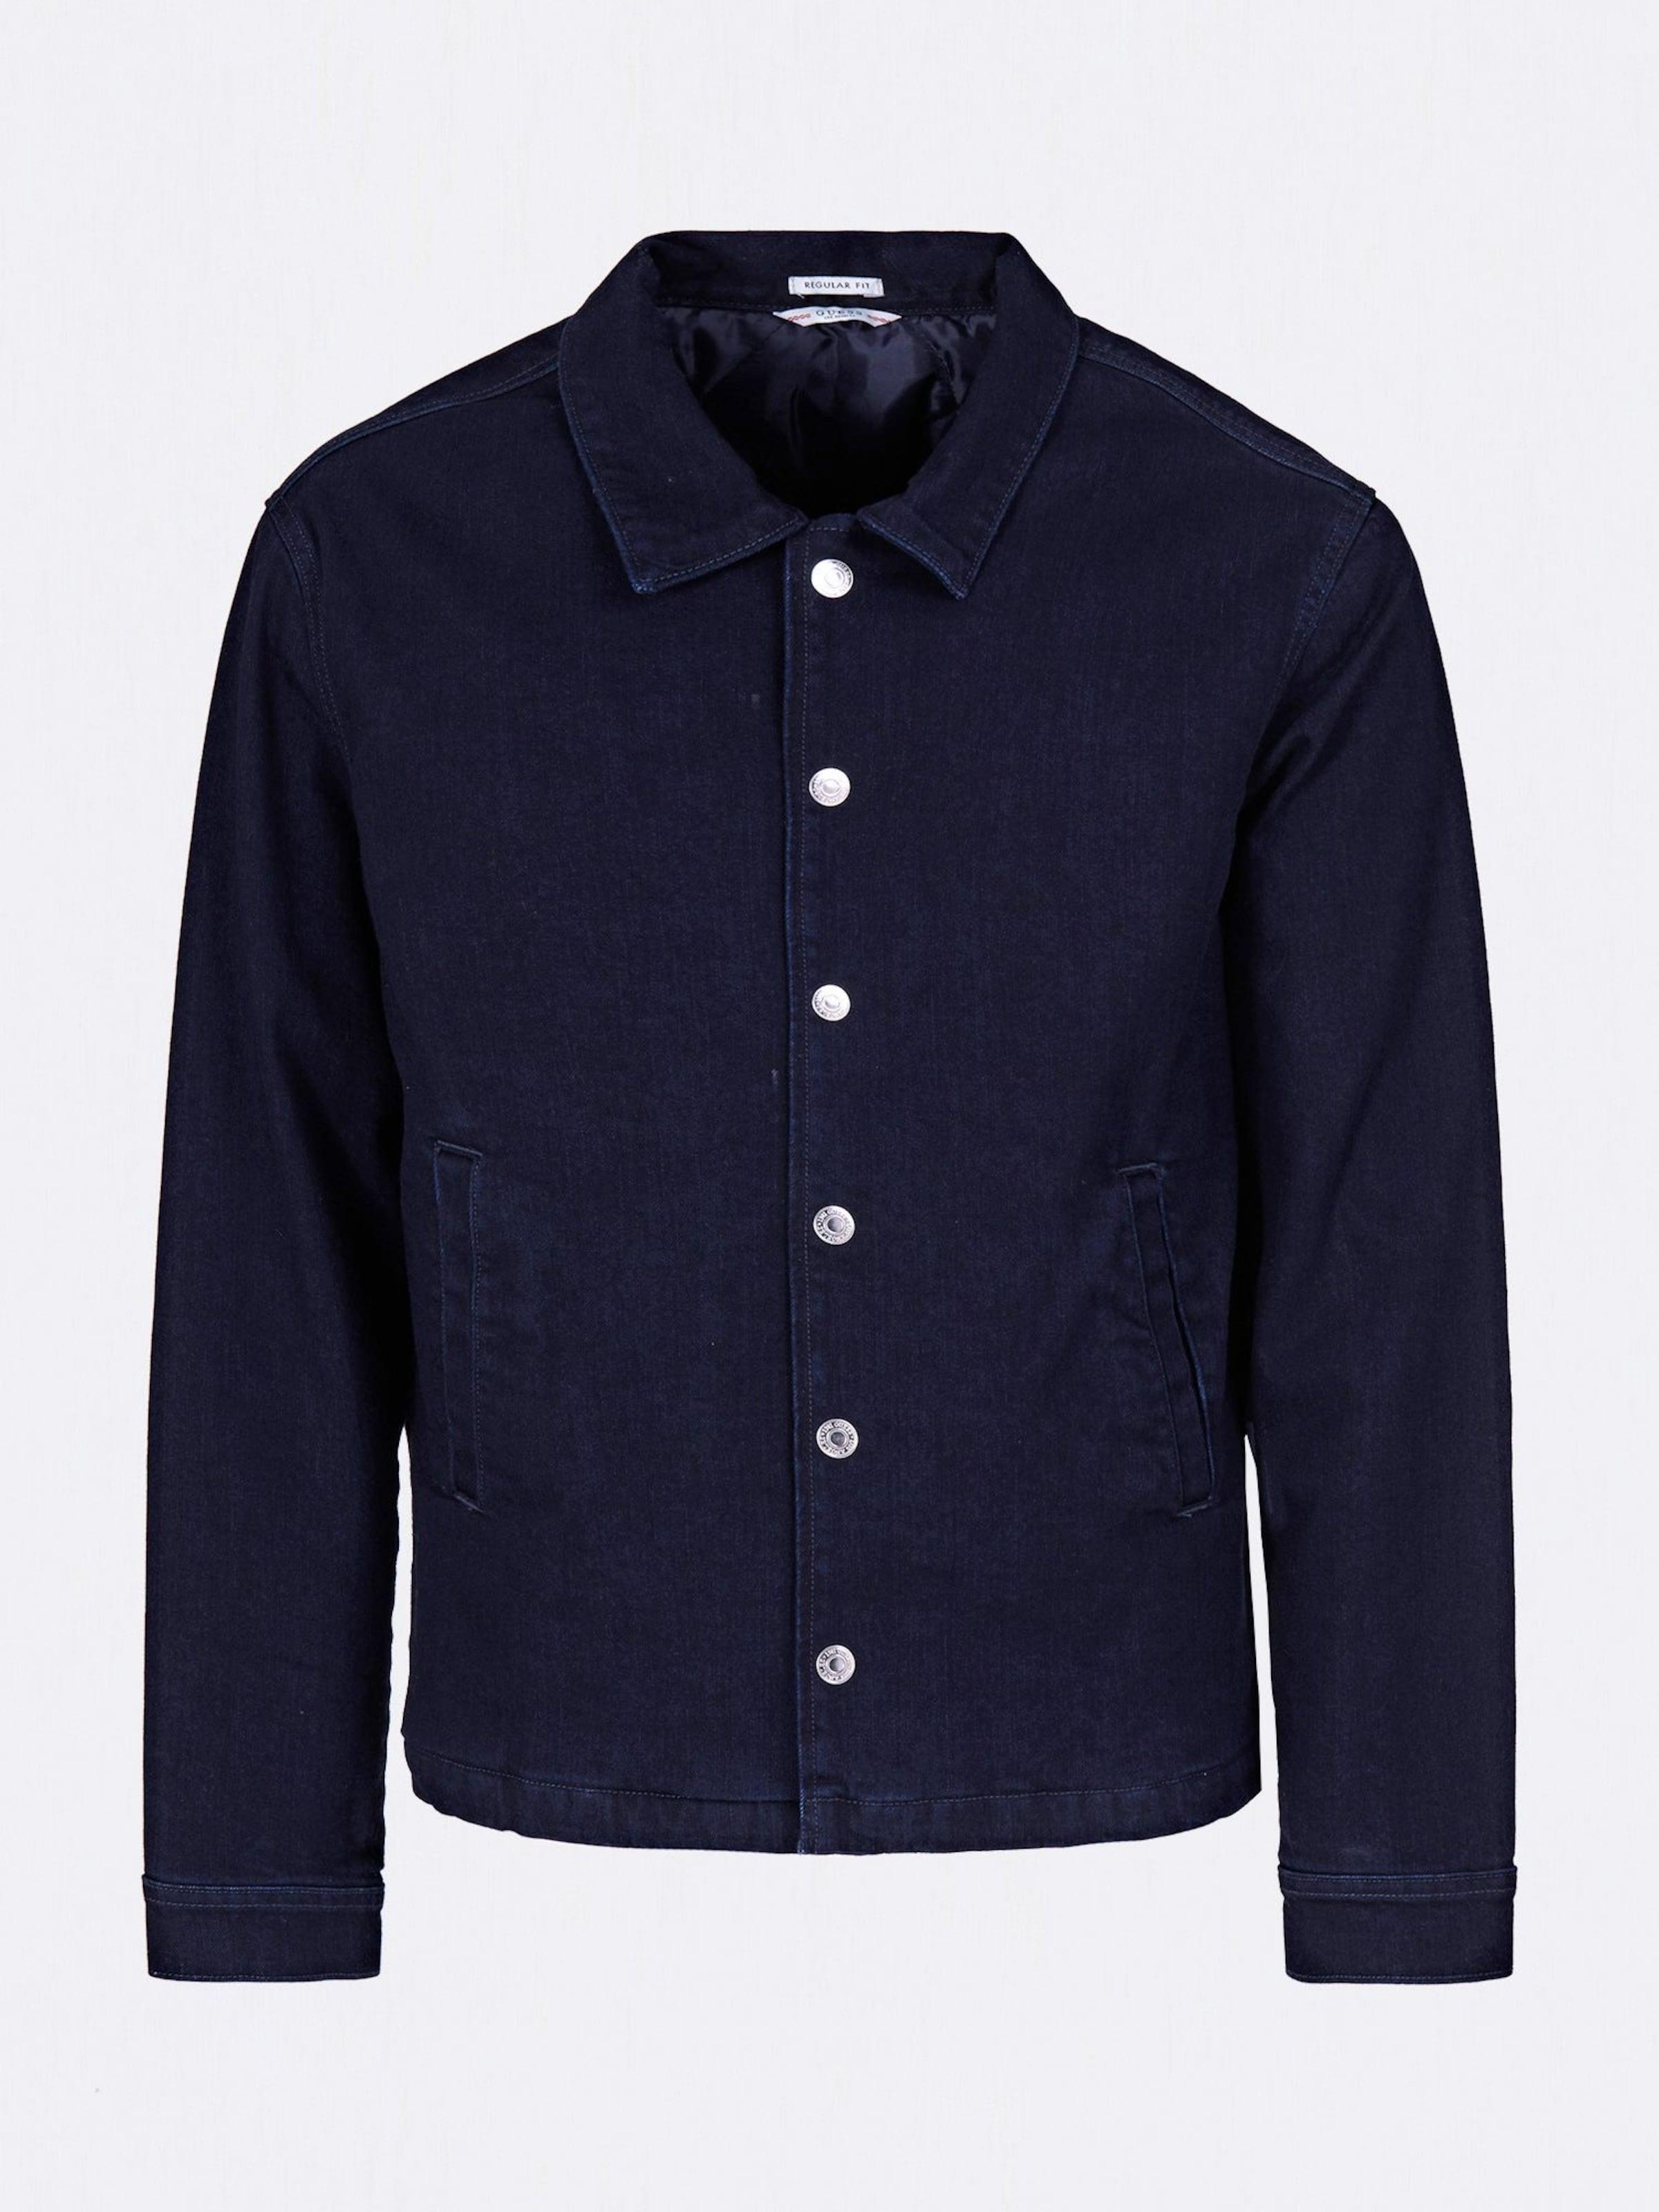 In Blau Guess Guess Jacke Guess Jacke In Blau In Jacke qGVpUzMS